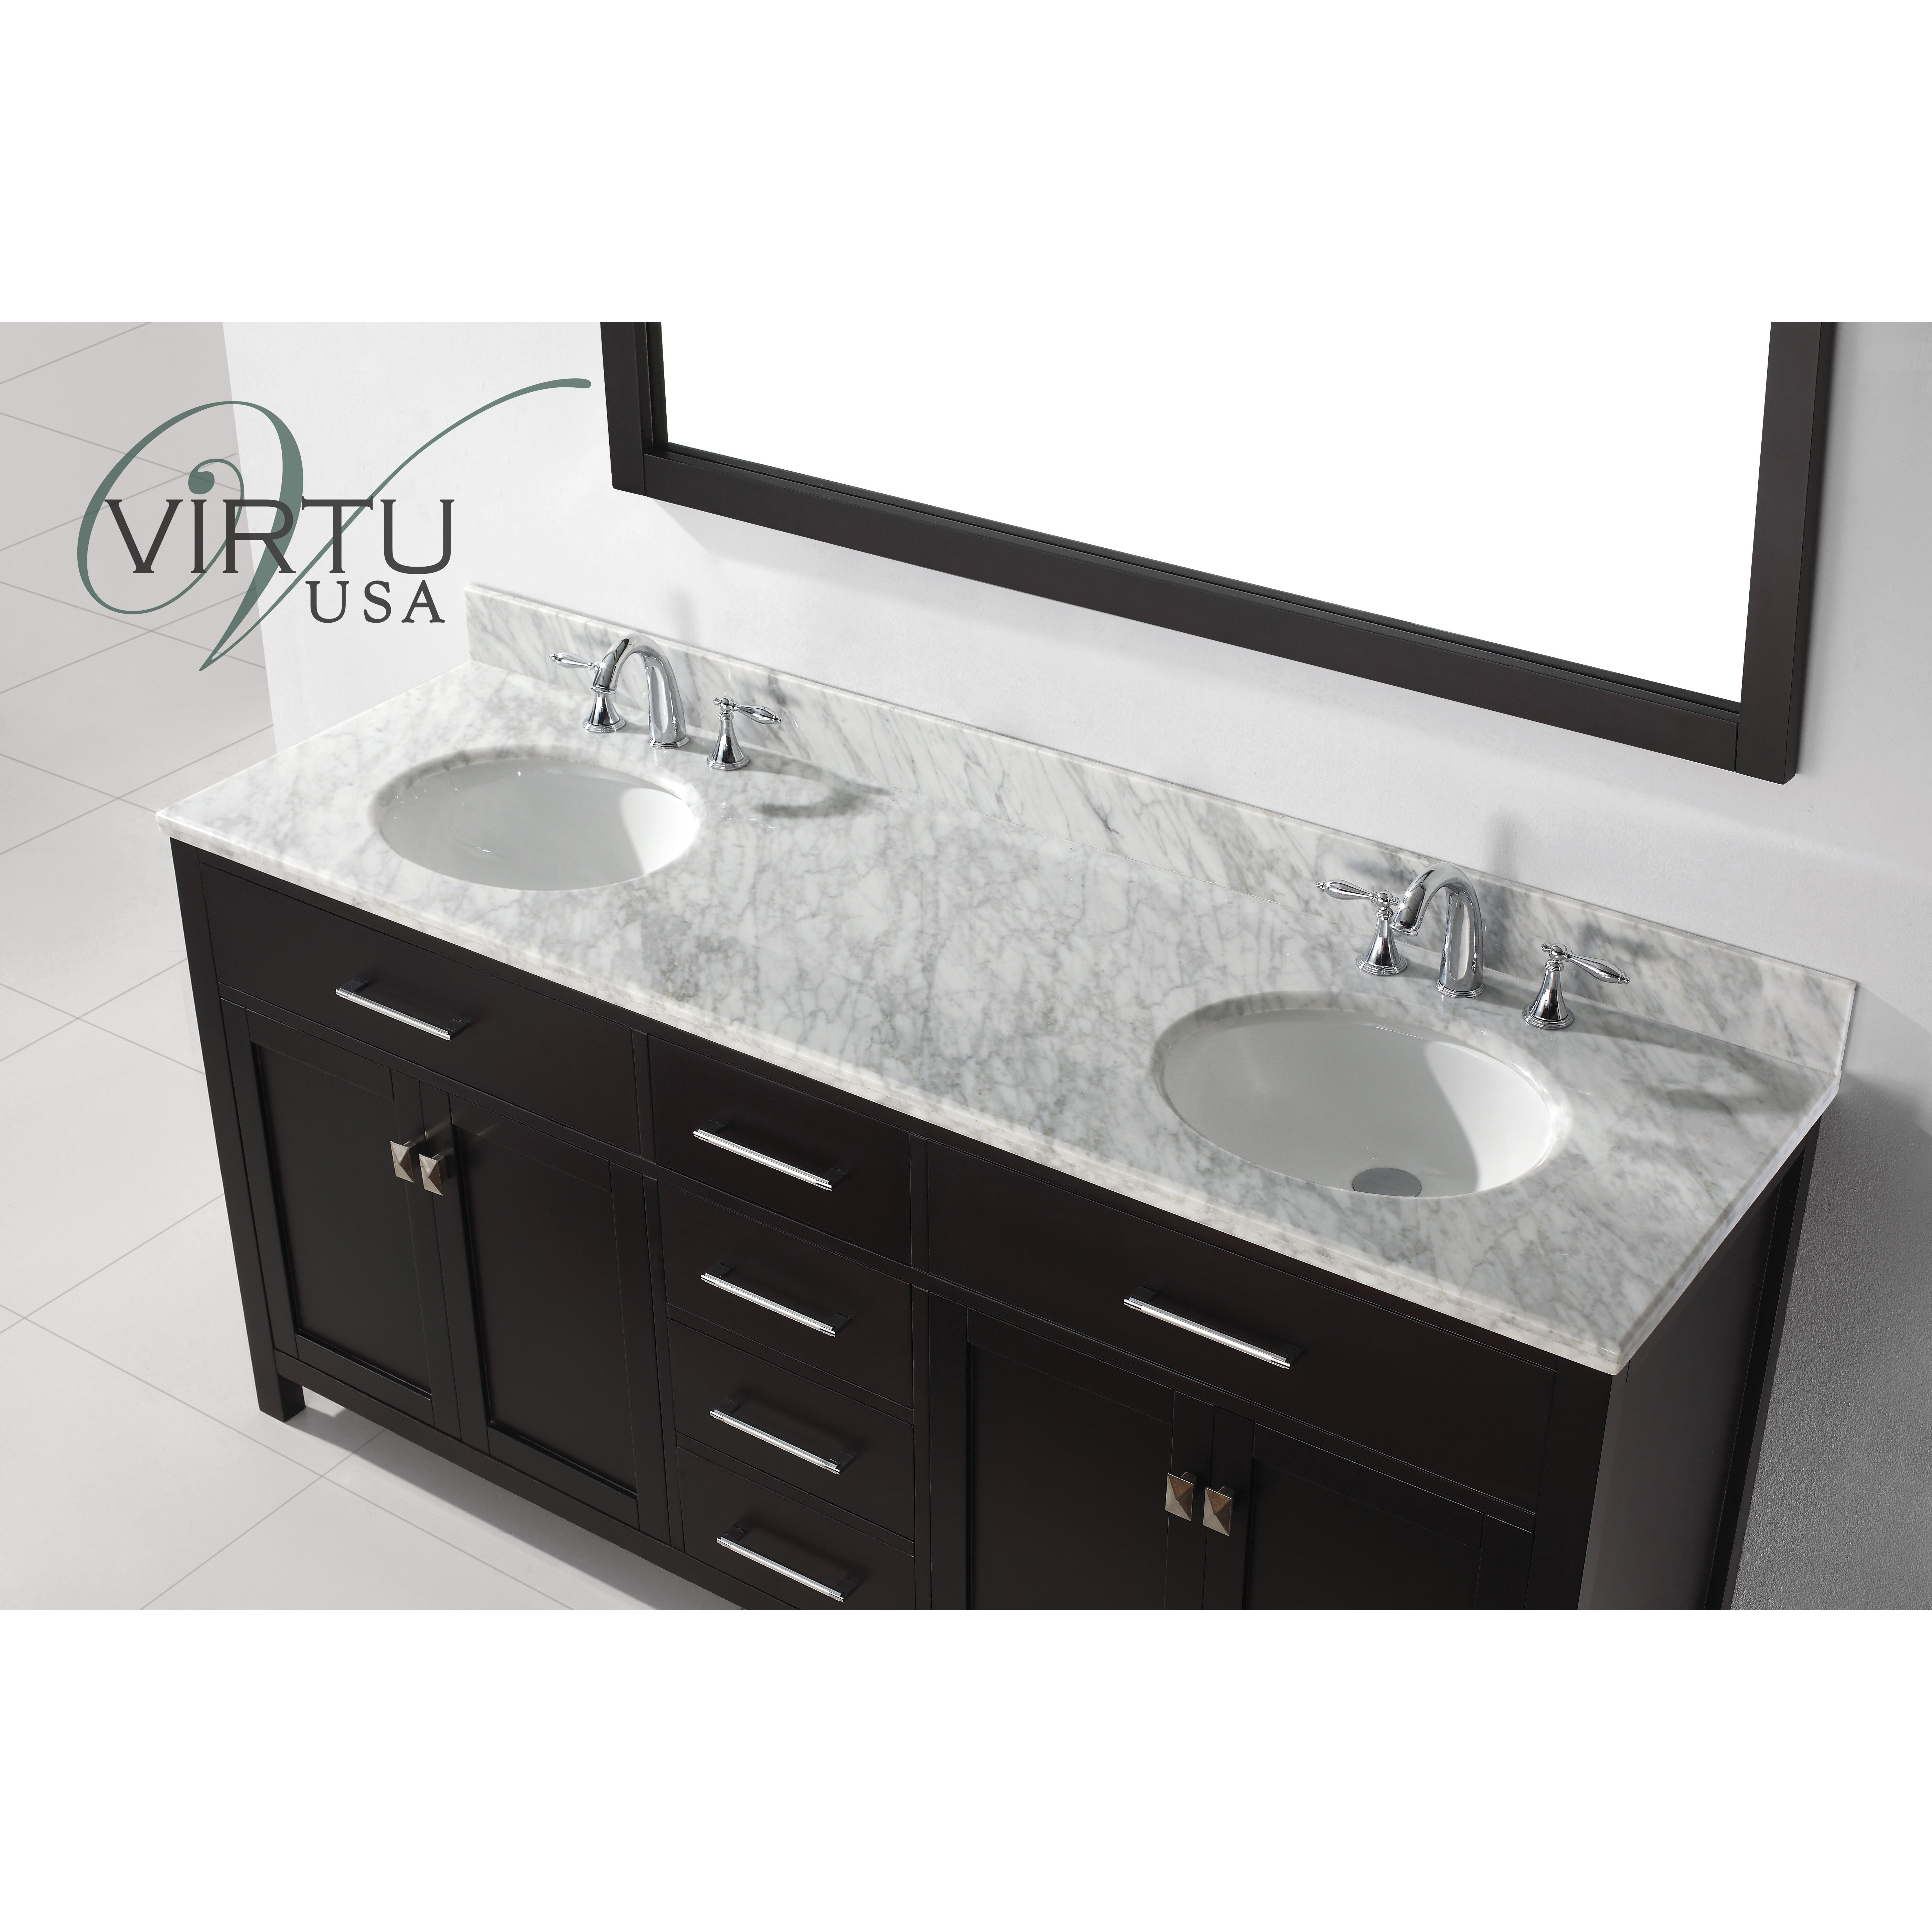 virtu caroline 72quot double bathroom vanity set with carrara white top and mirror - Ensemble Vanite Armoire